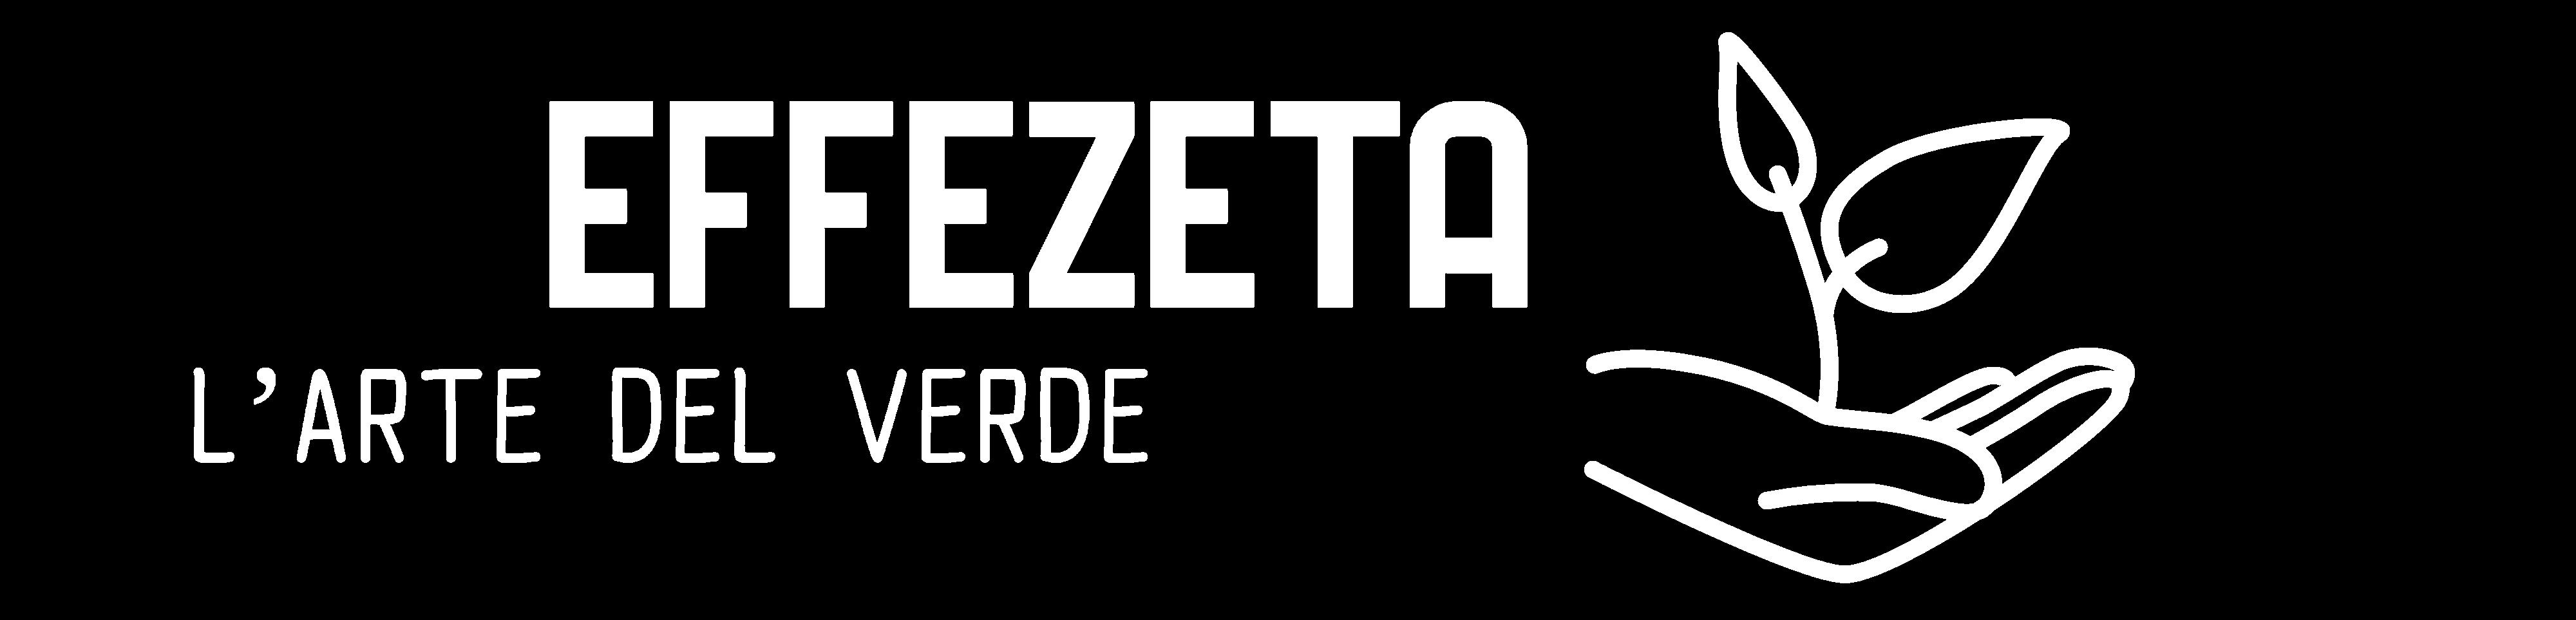 vivaioeffezeta